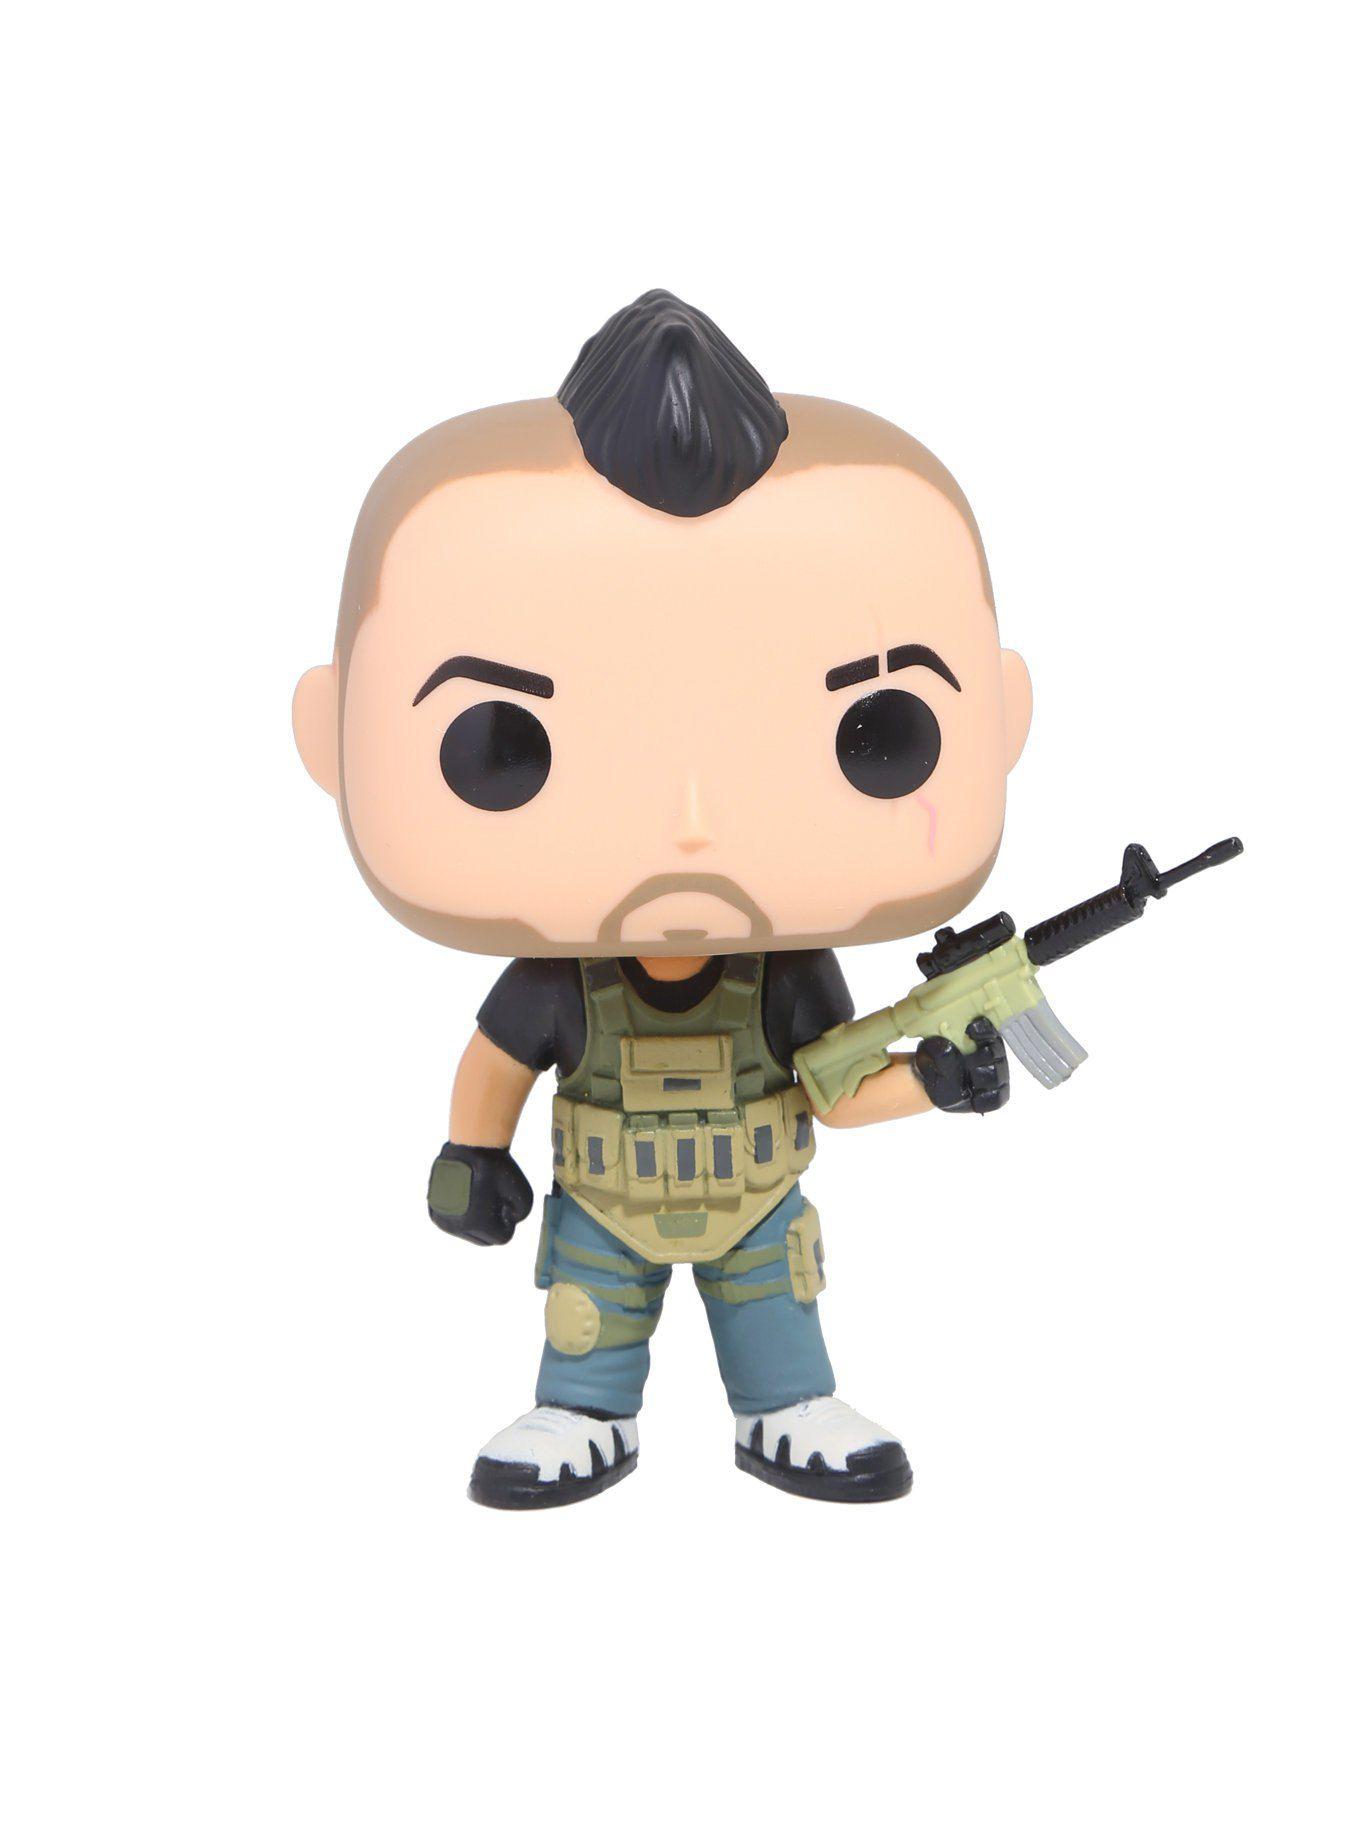 John Soap MacTavish #143 - Call of Duty - Funko Pop! Games